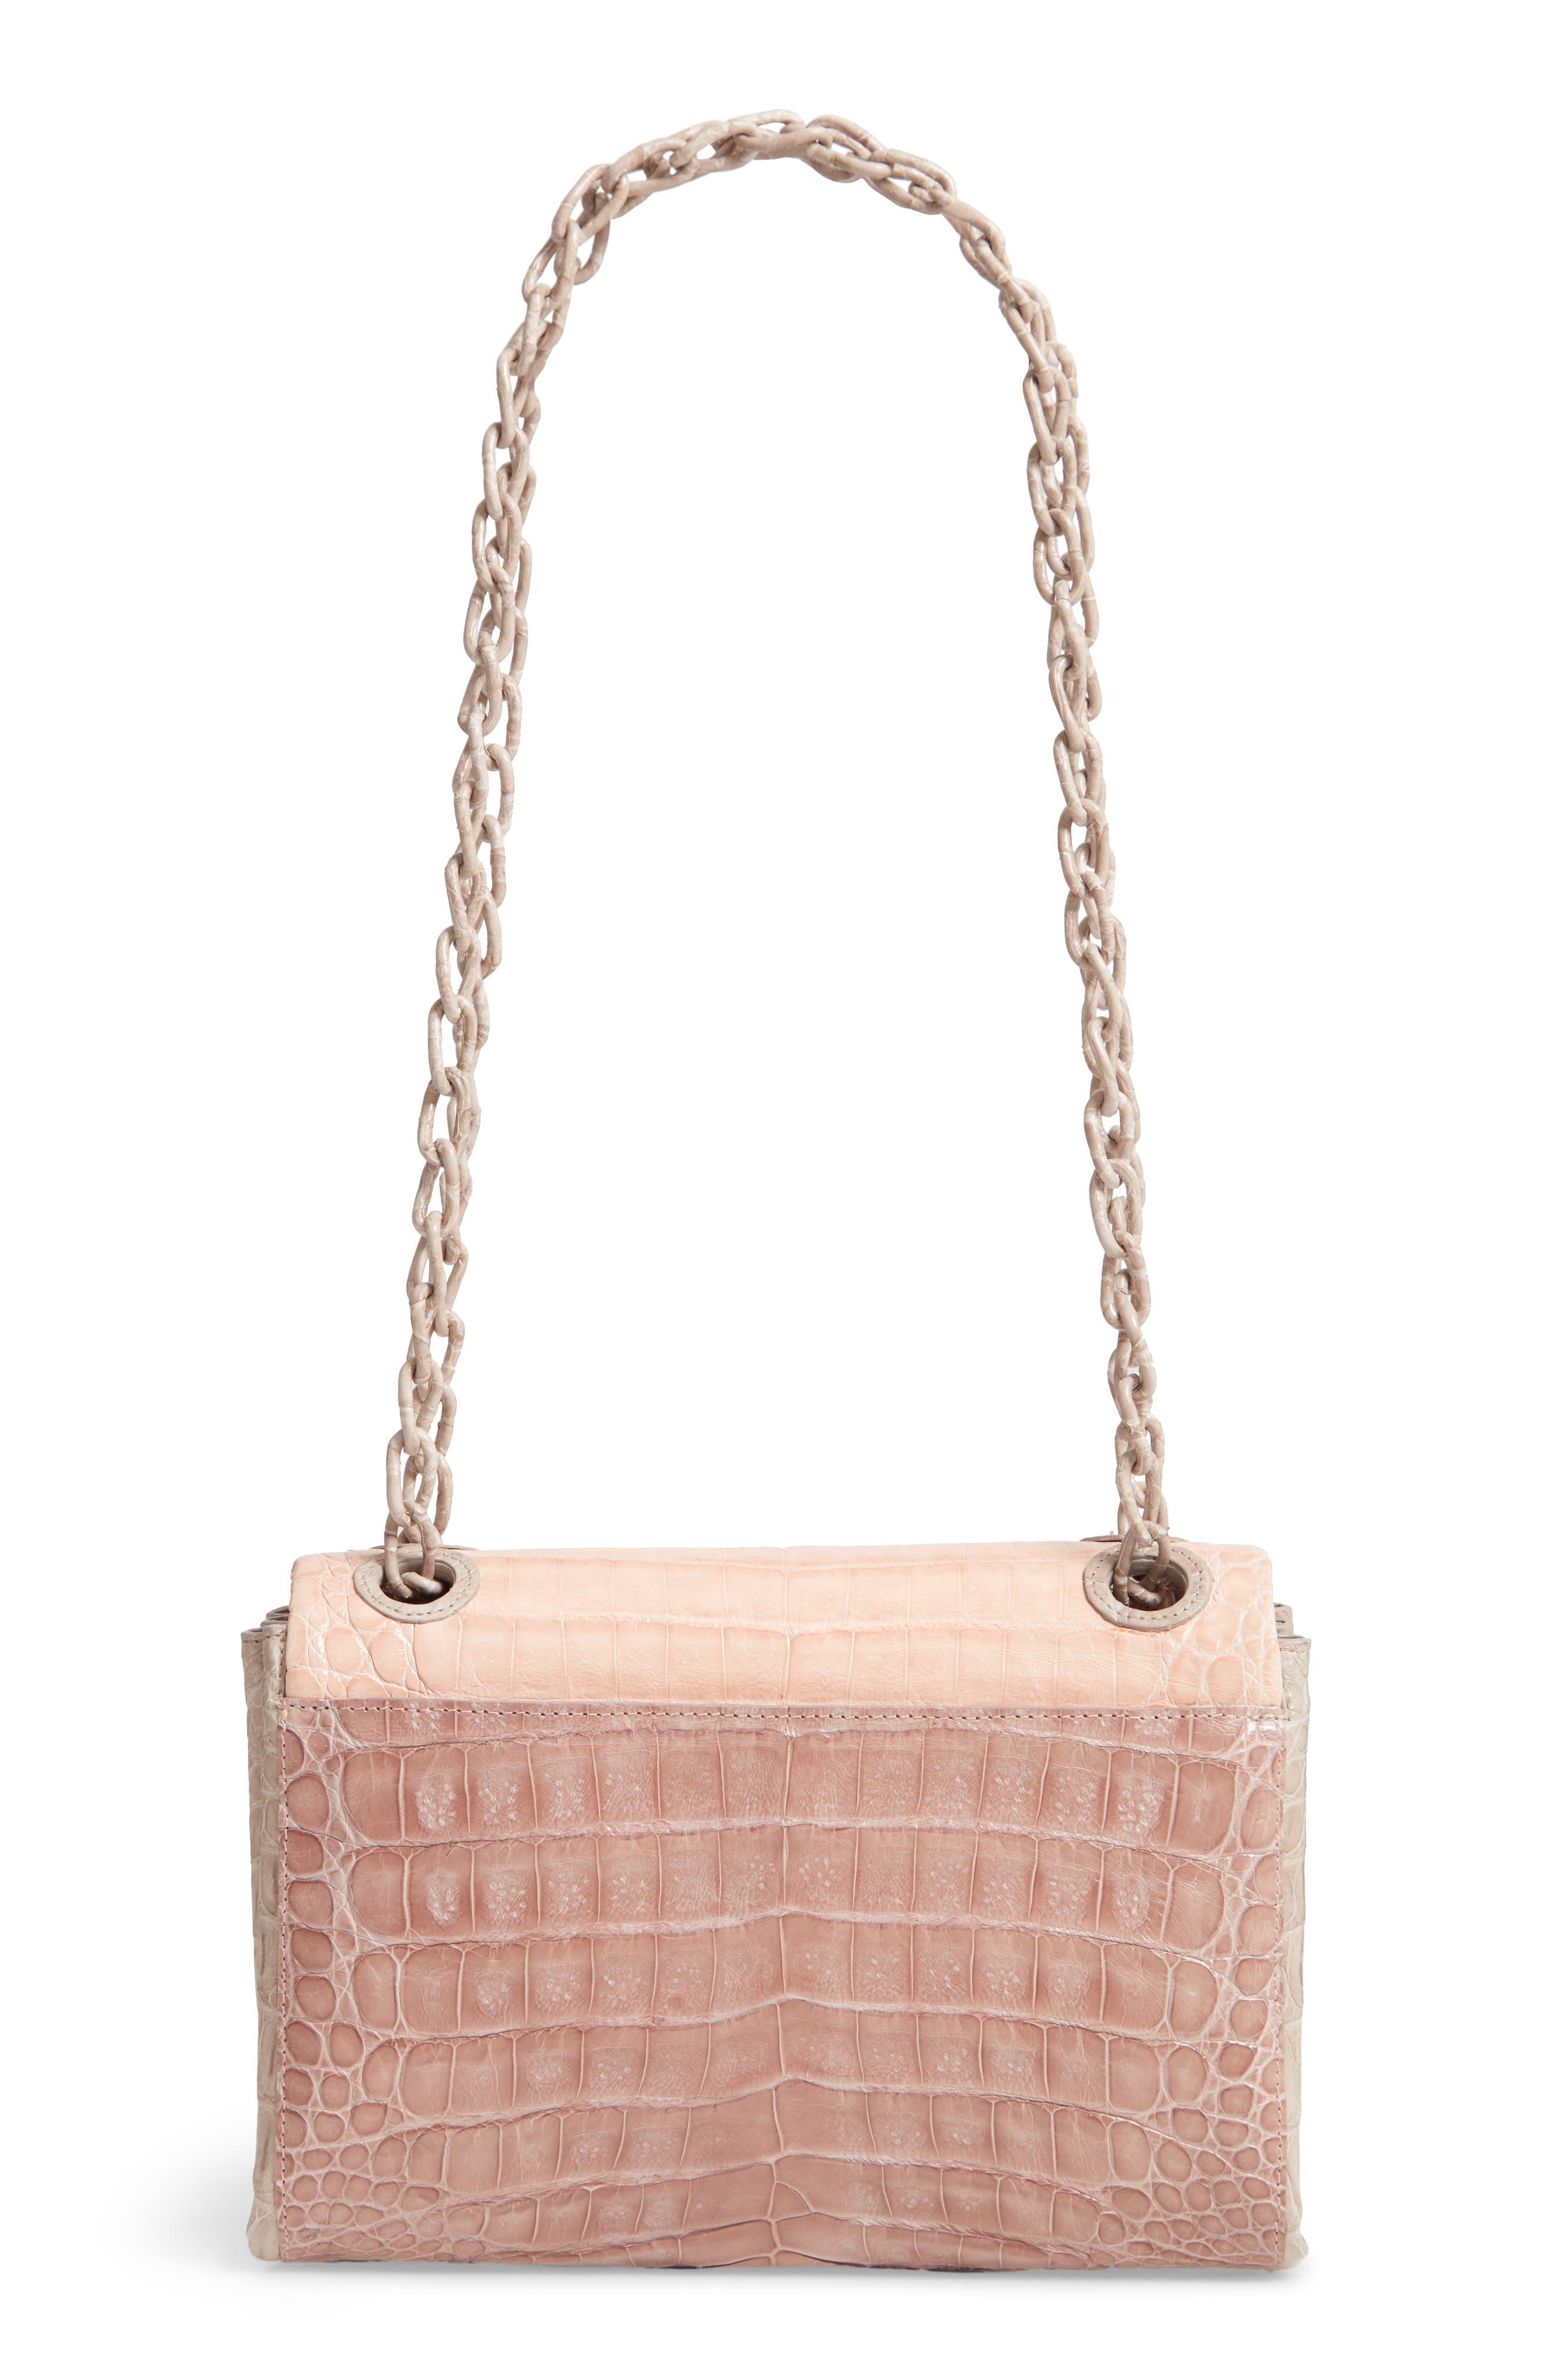 Small Madison Genuine Crocodile Shoulder Bag,                             Alternate thumbnail 4, color,                             NUDE/ TAUPE/ BLUSH